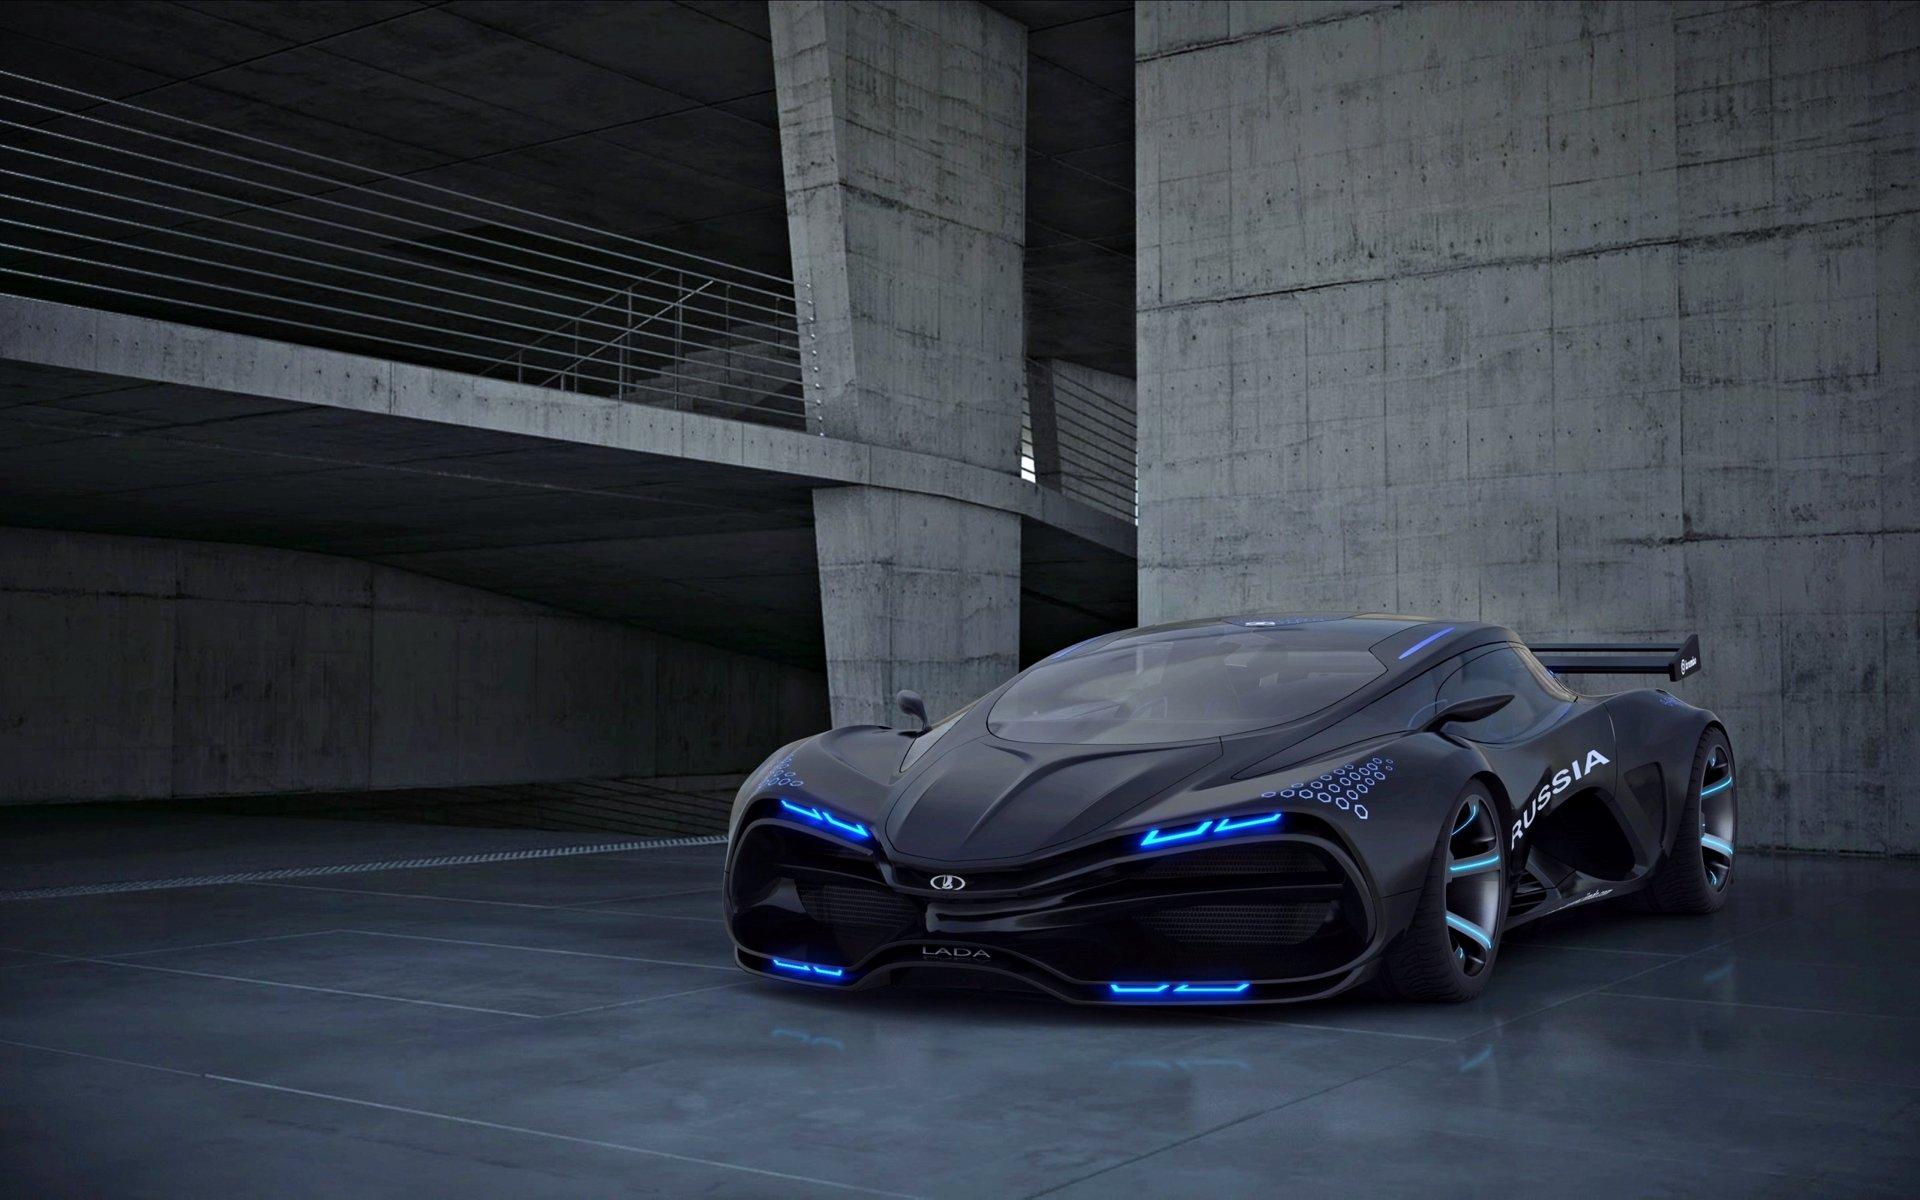 座驾 - Lada Raven  Black Car 汽车 Supercar 壁纸